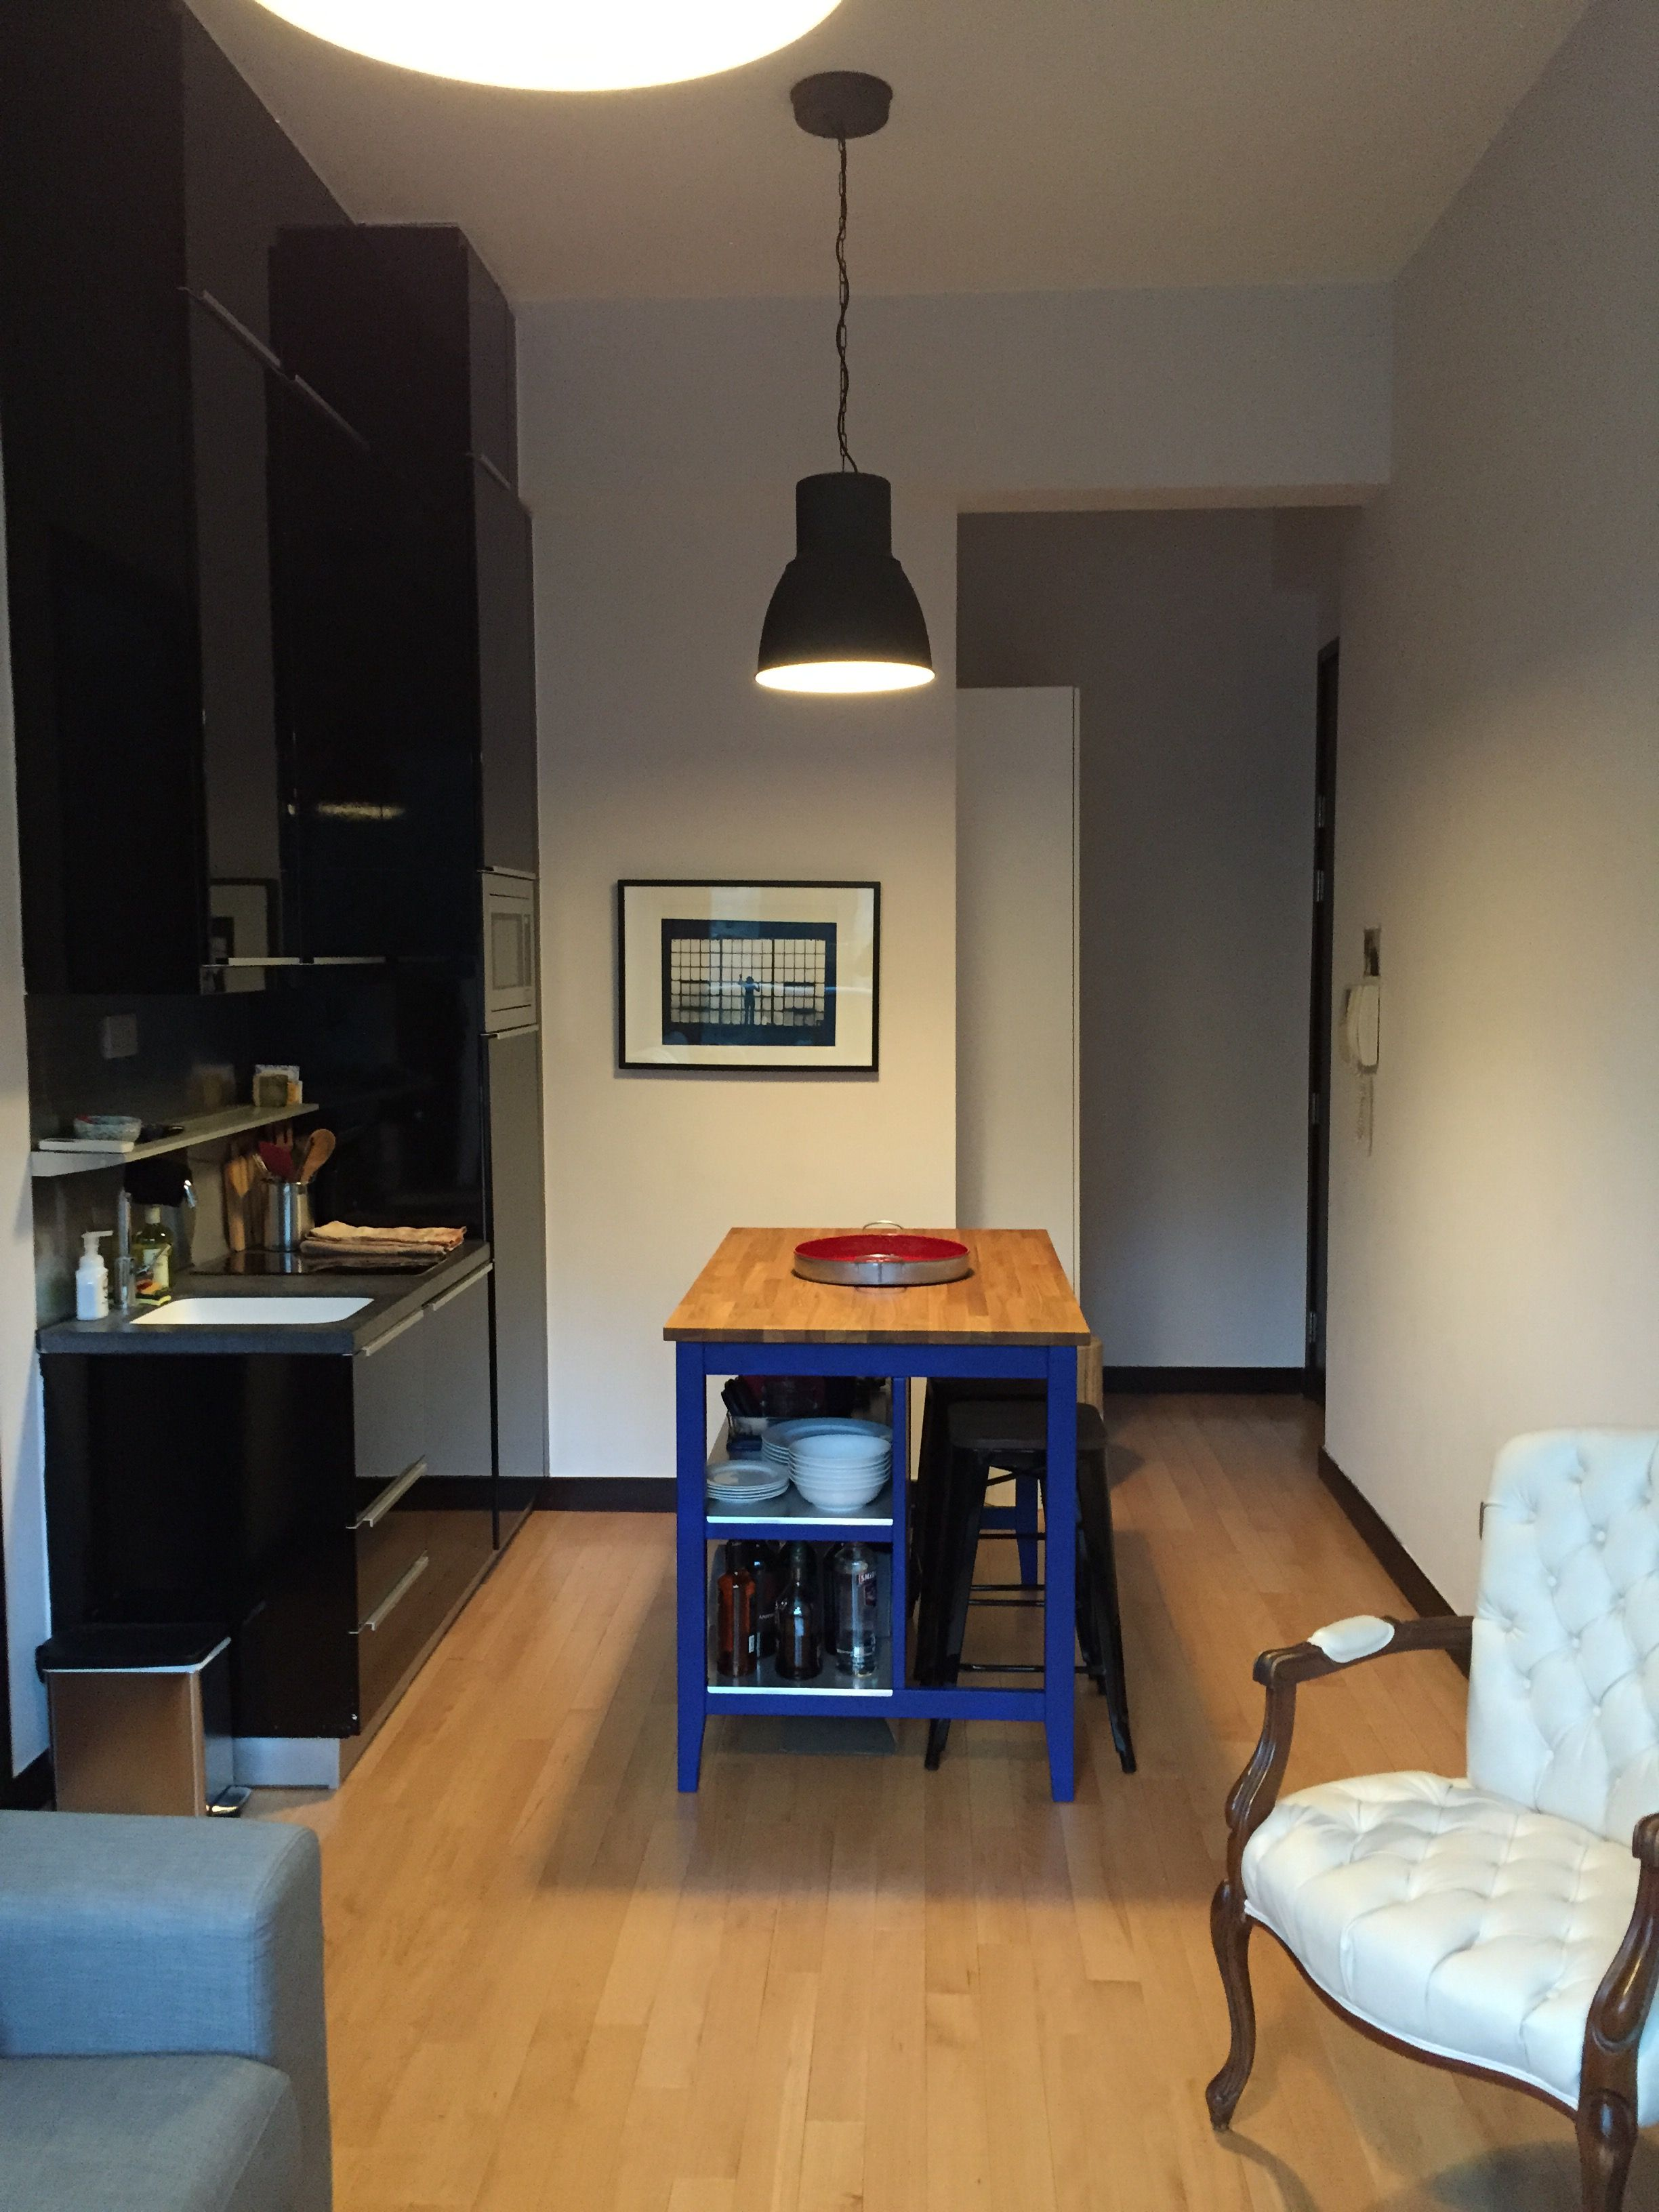 440 sq ft apartment kitchen Ikea Stenstorp kitchen island Hong